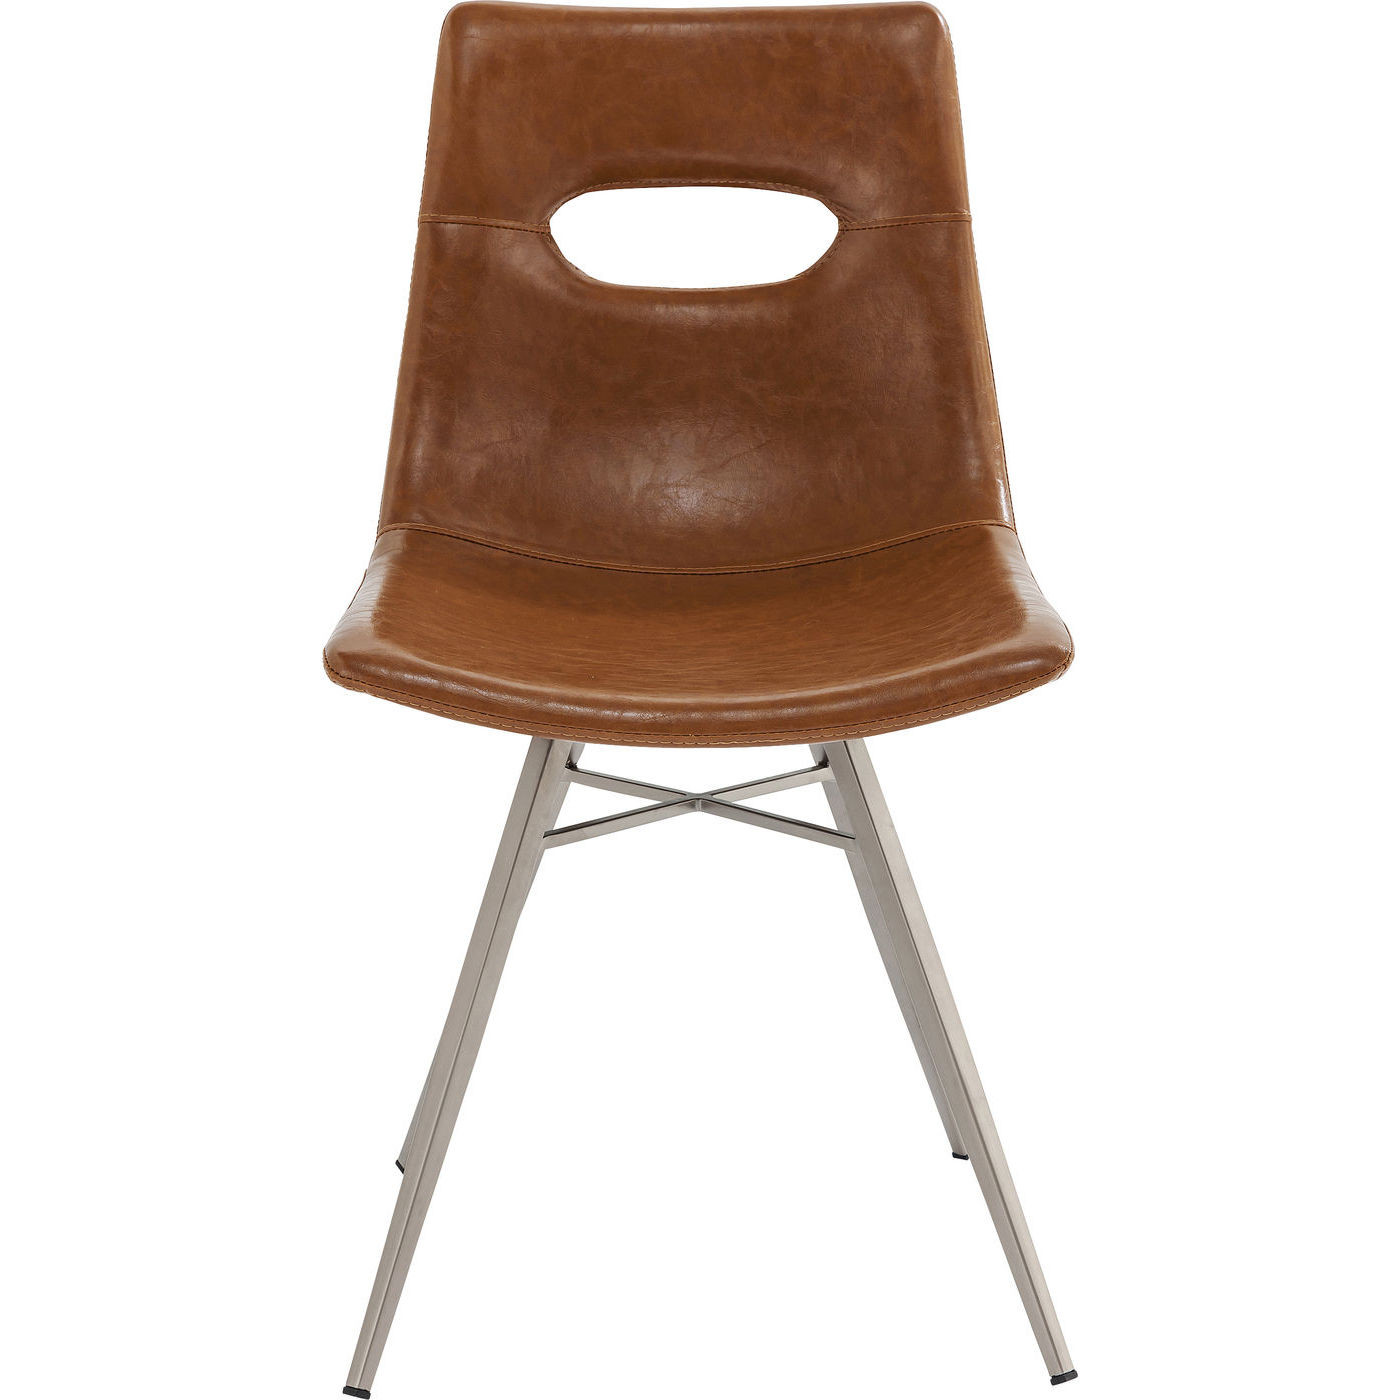 Stuhl venice hellbraun kare design mutoni m bel for Kare design schweiz